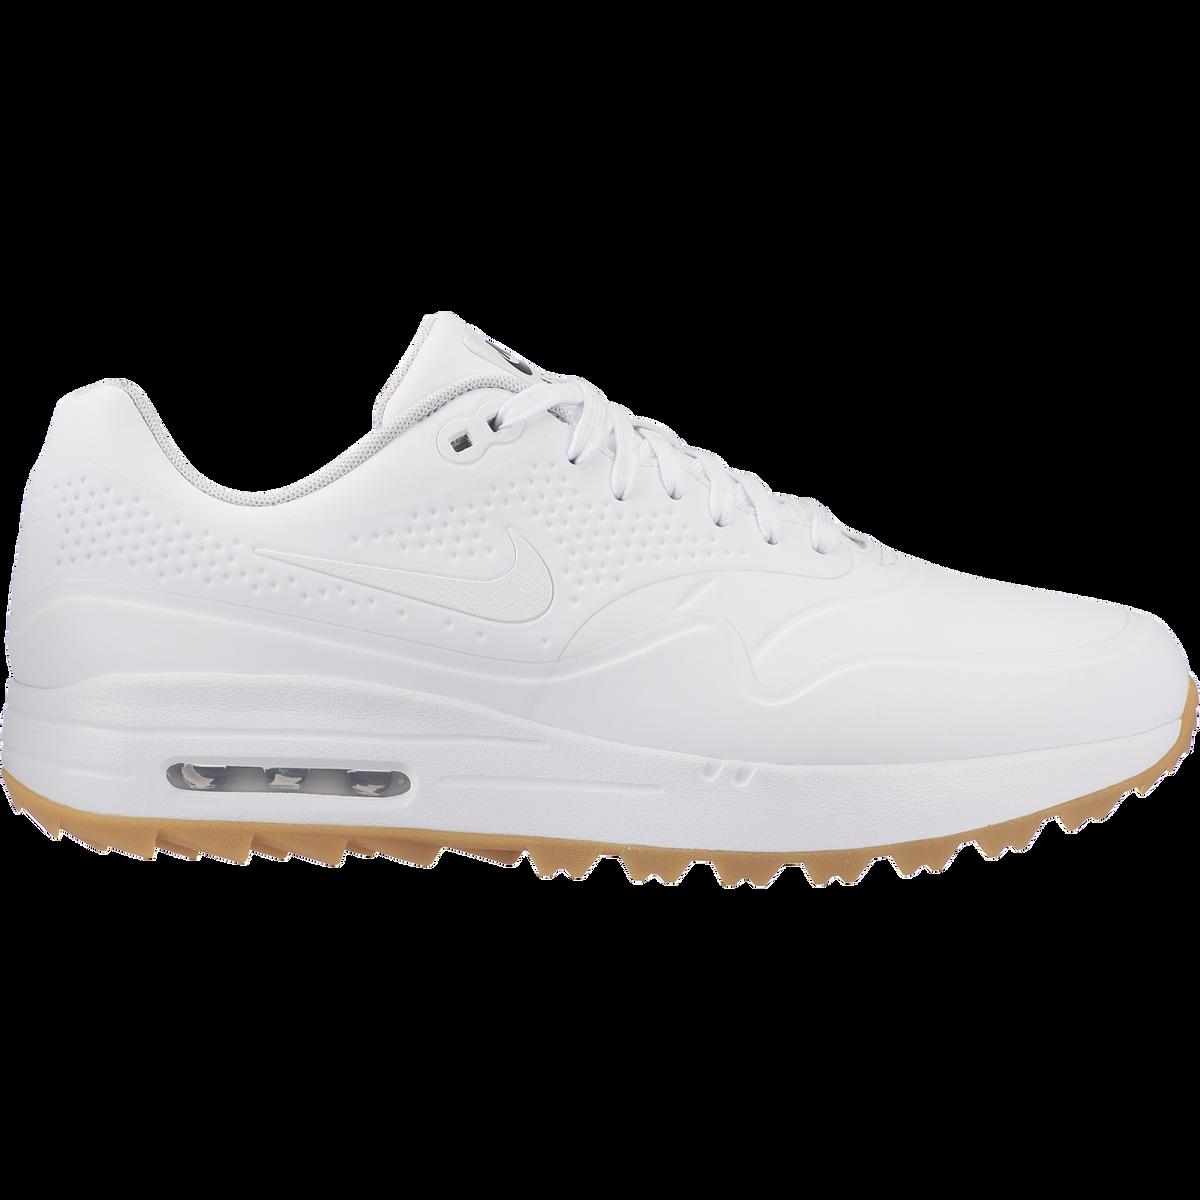 3ecbdcb3651e Nike Air Max 1G Men s Golf Shoe - White